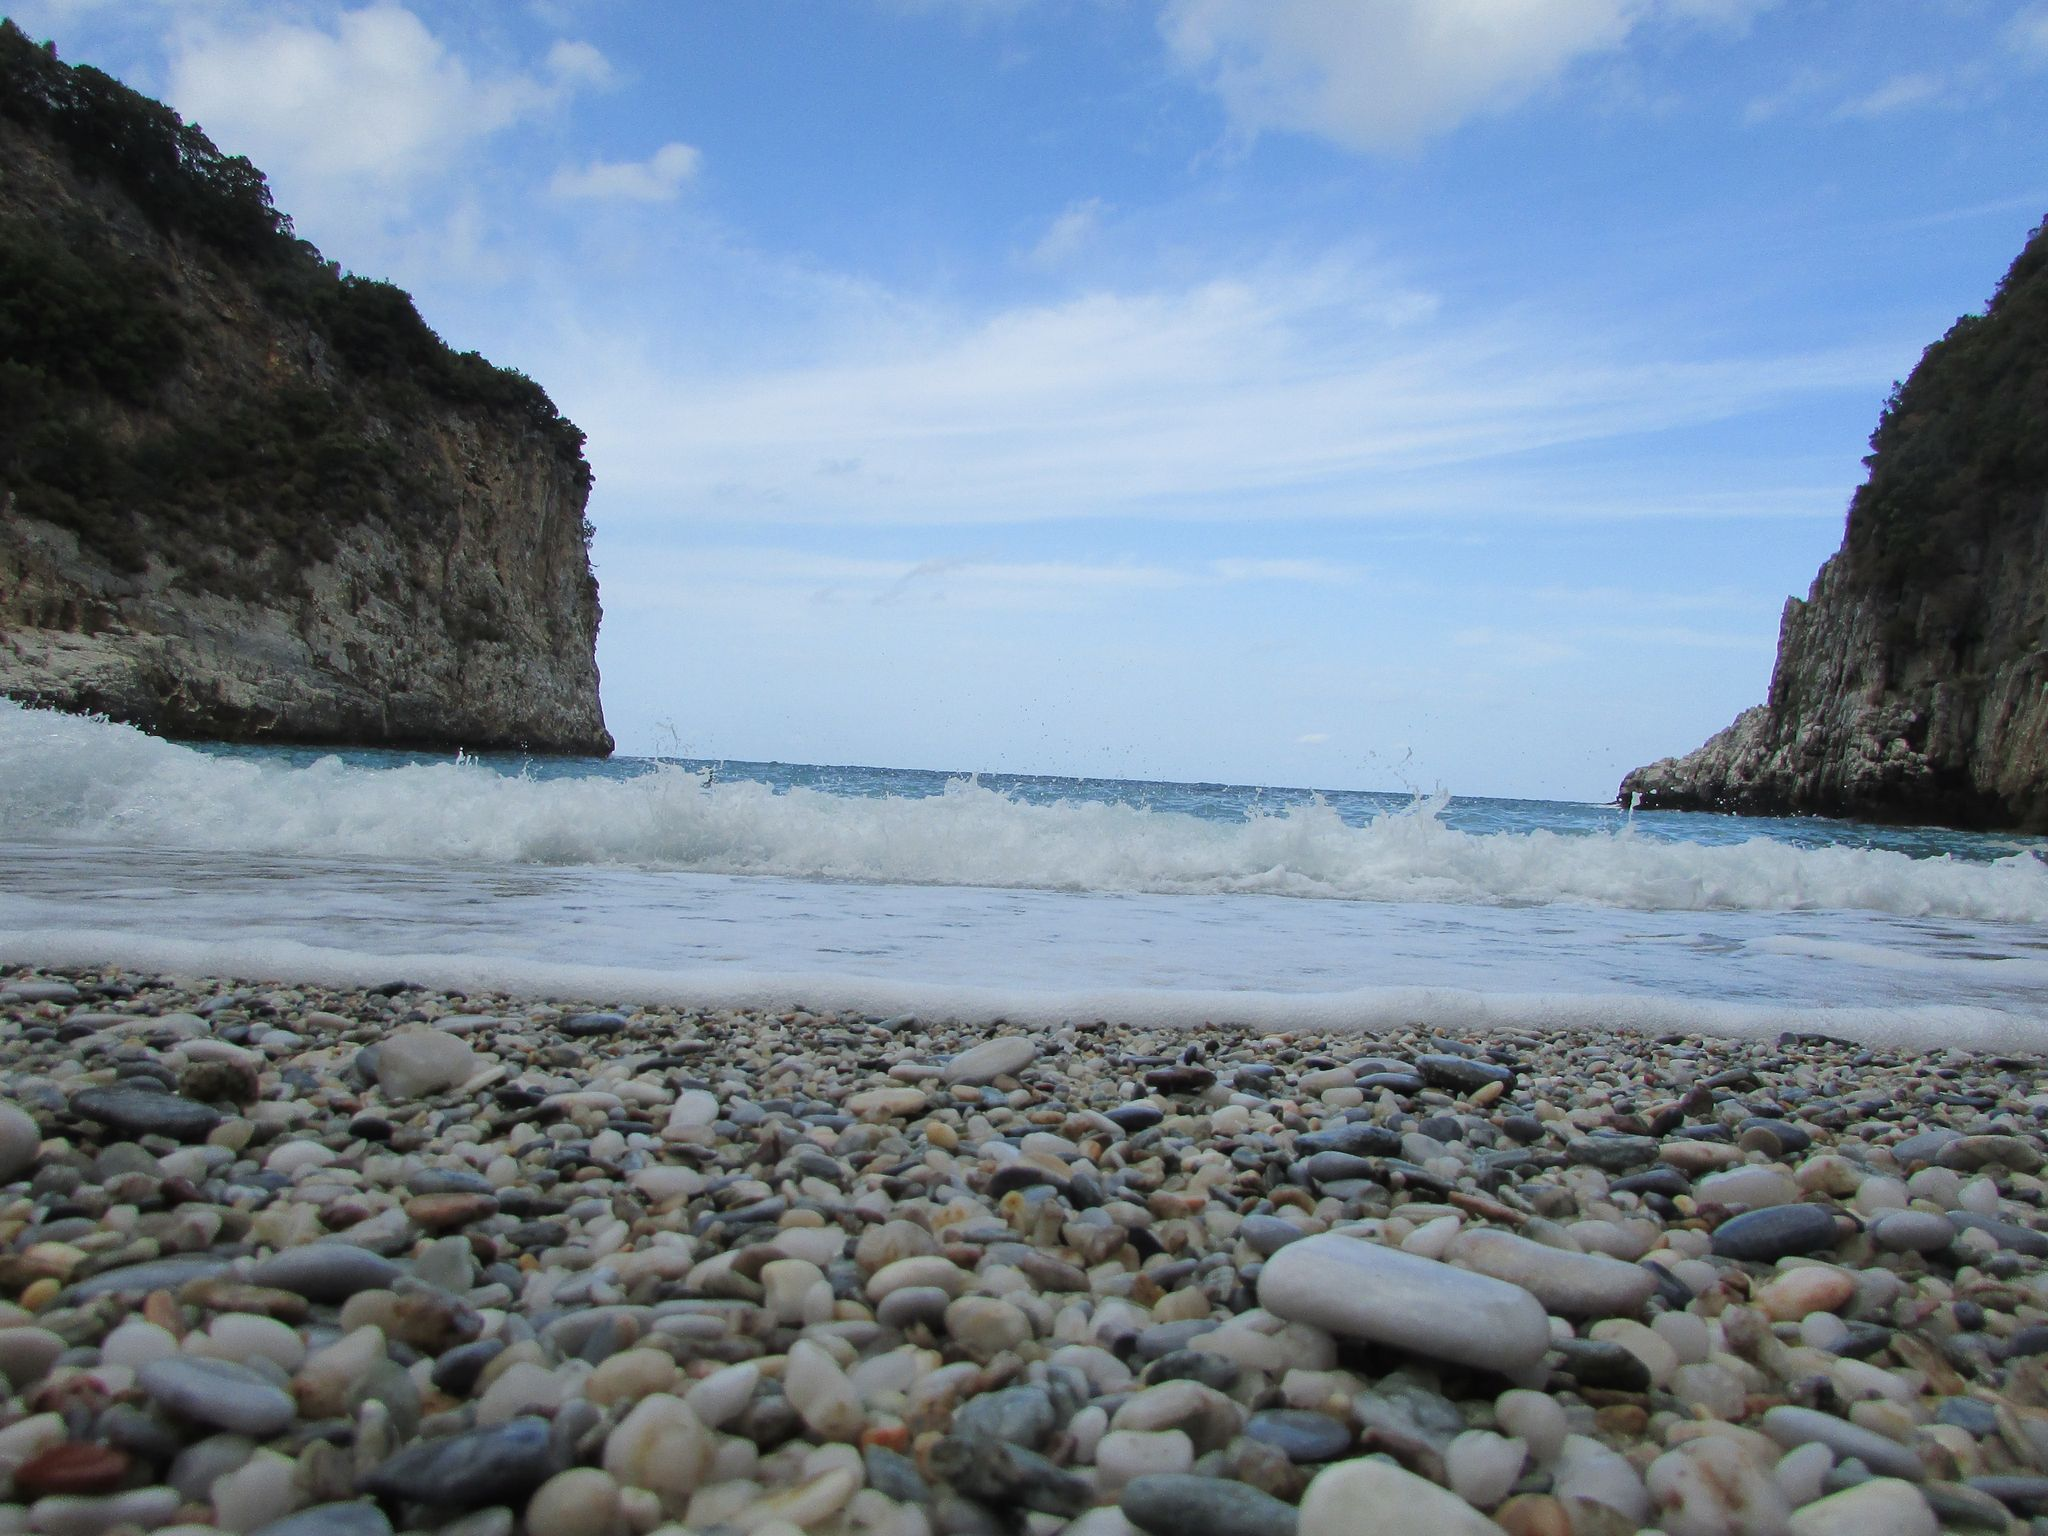 плаж Факистра, Пилио